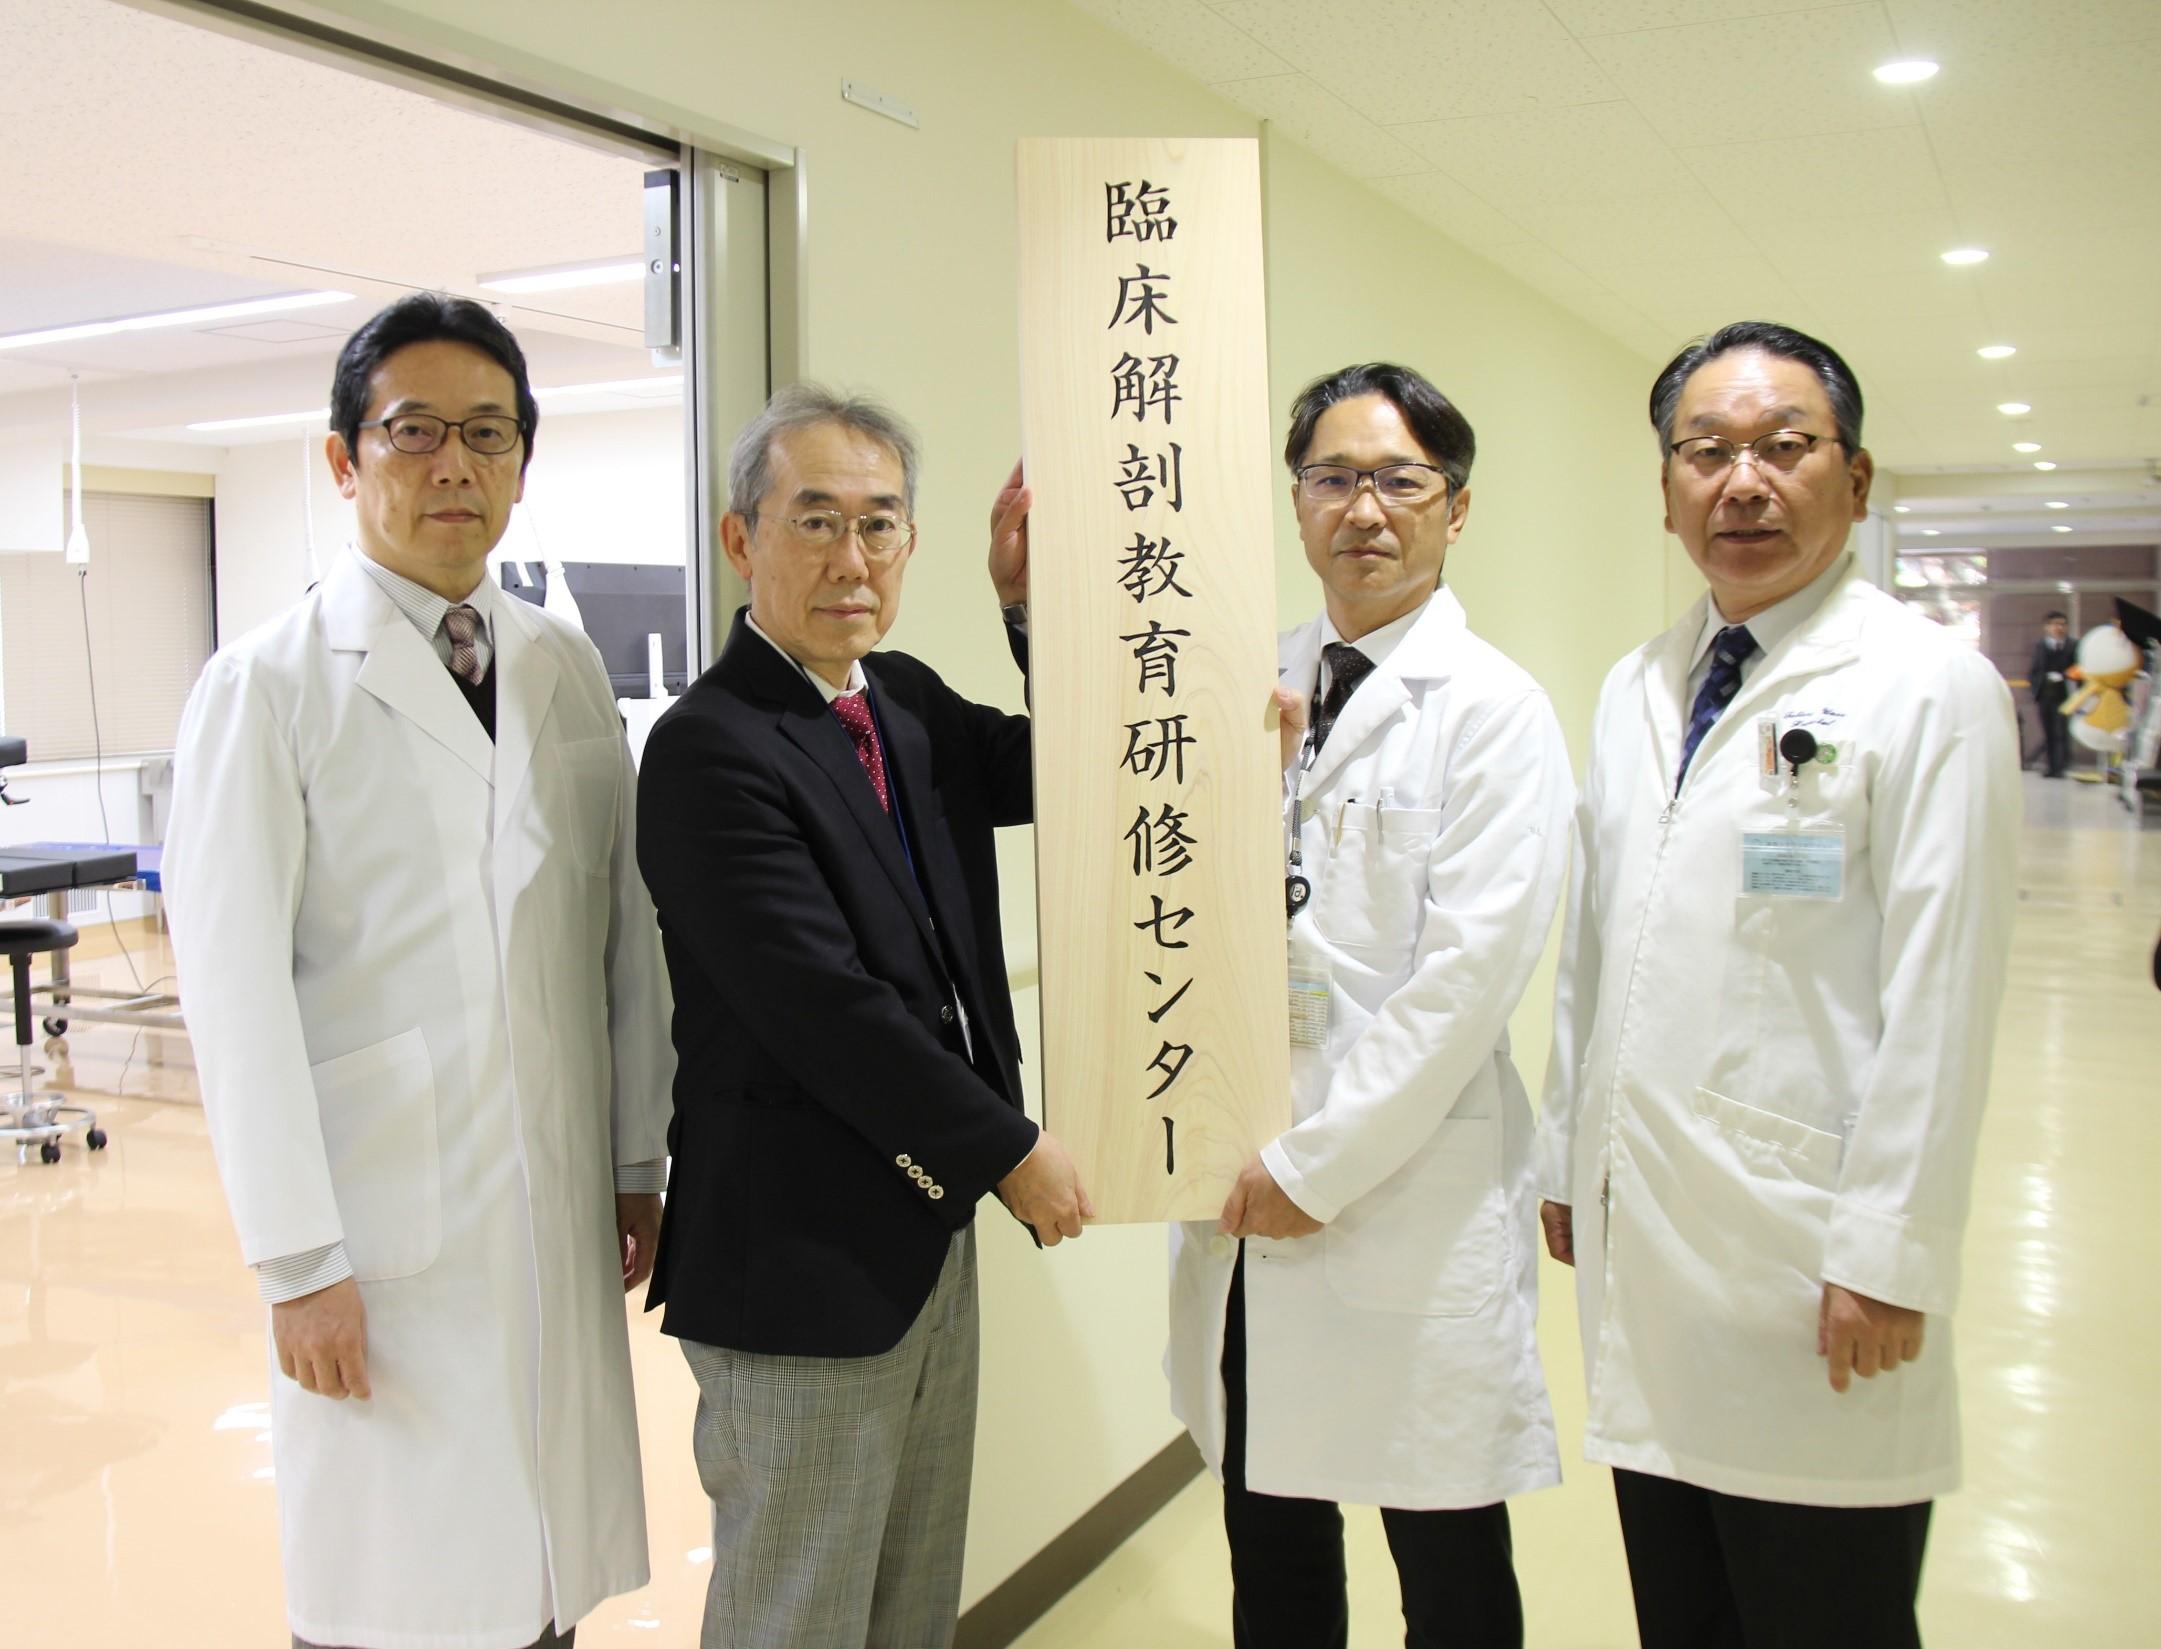 011127_(新着情報)臨床解剖教育研修センター